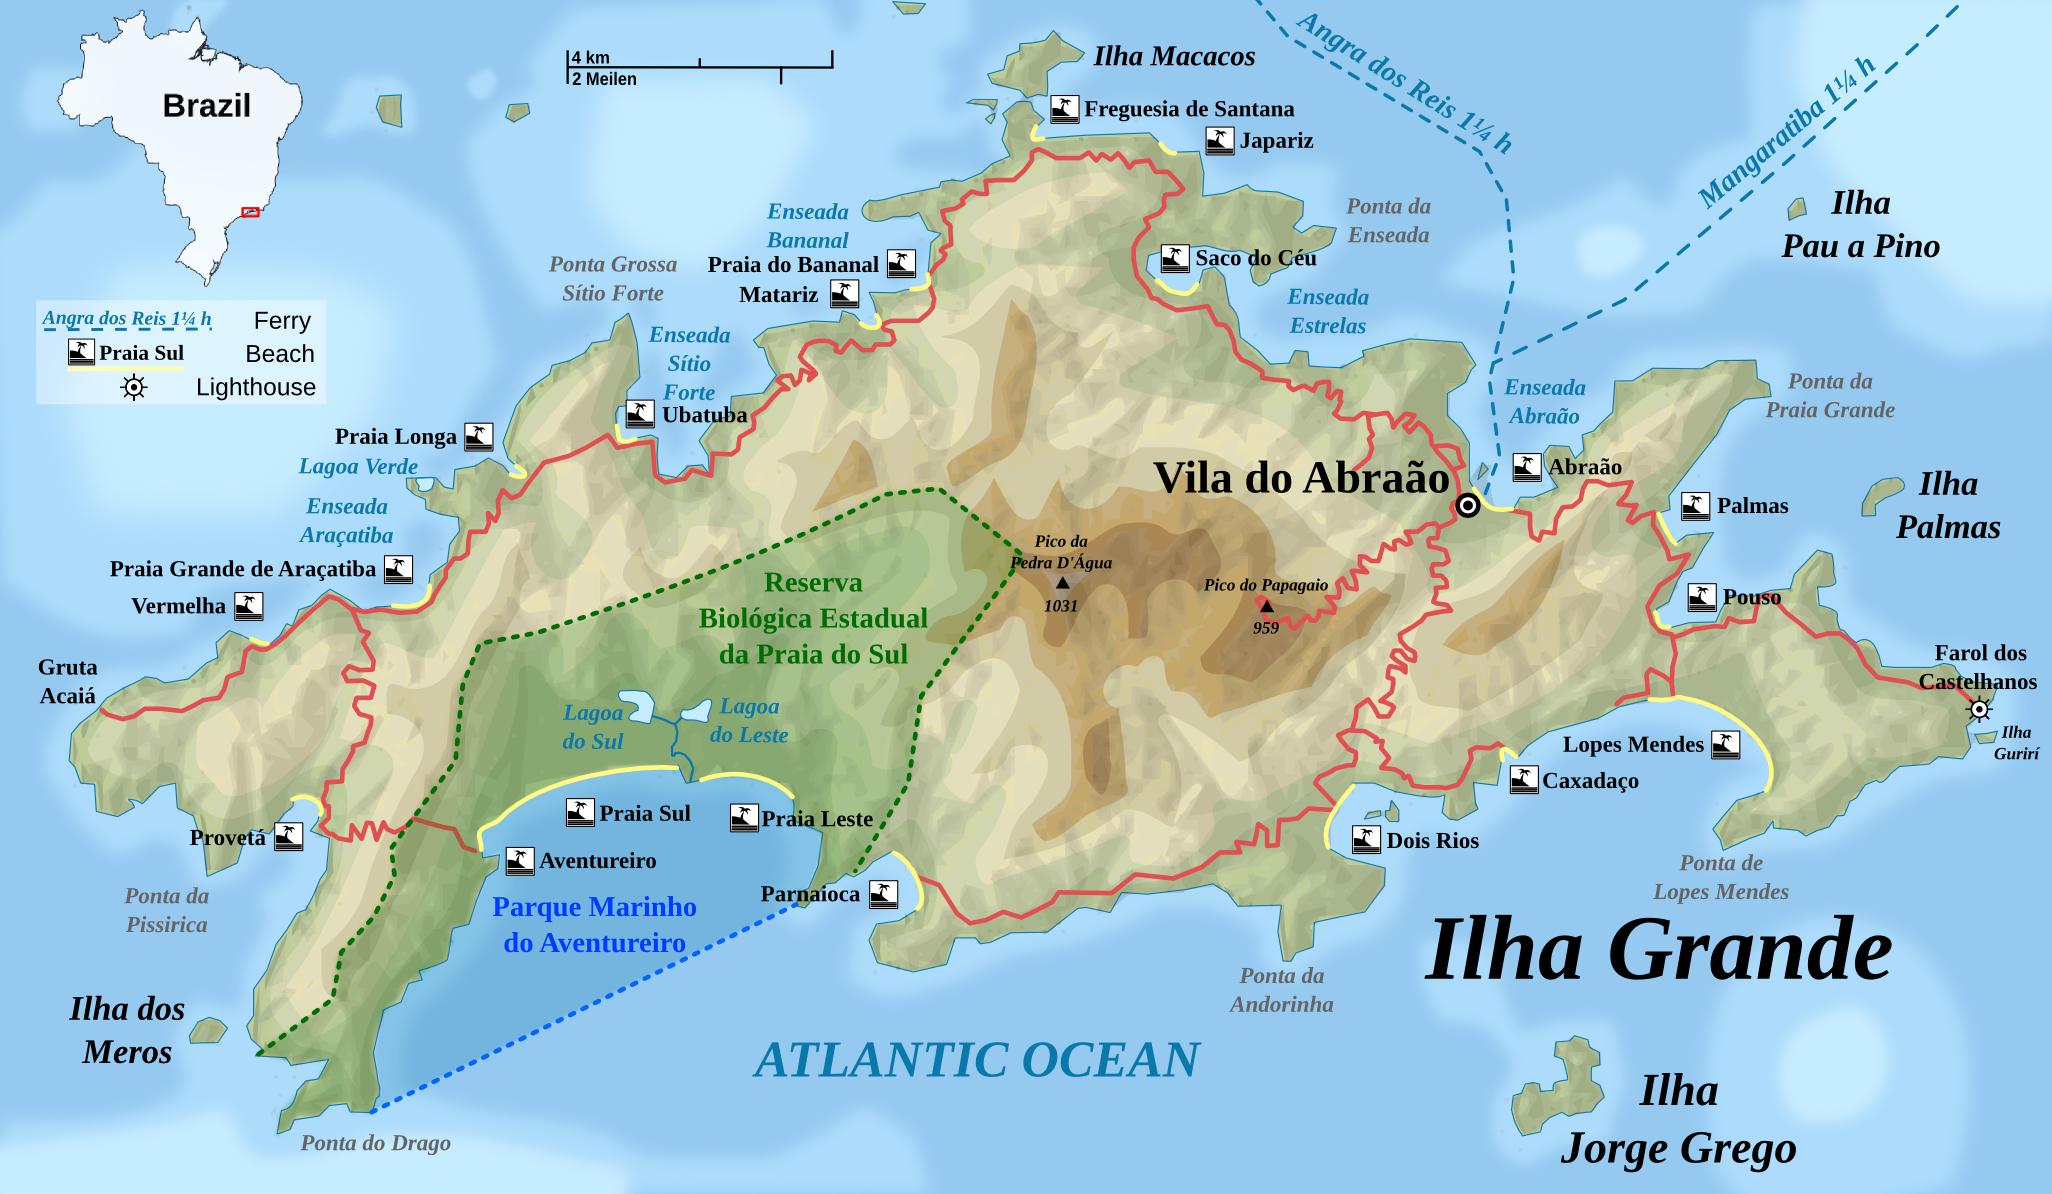 Vaizdas Ilha Grande Topographic Map En Png Vikipedija